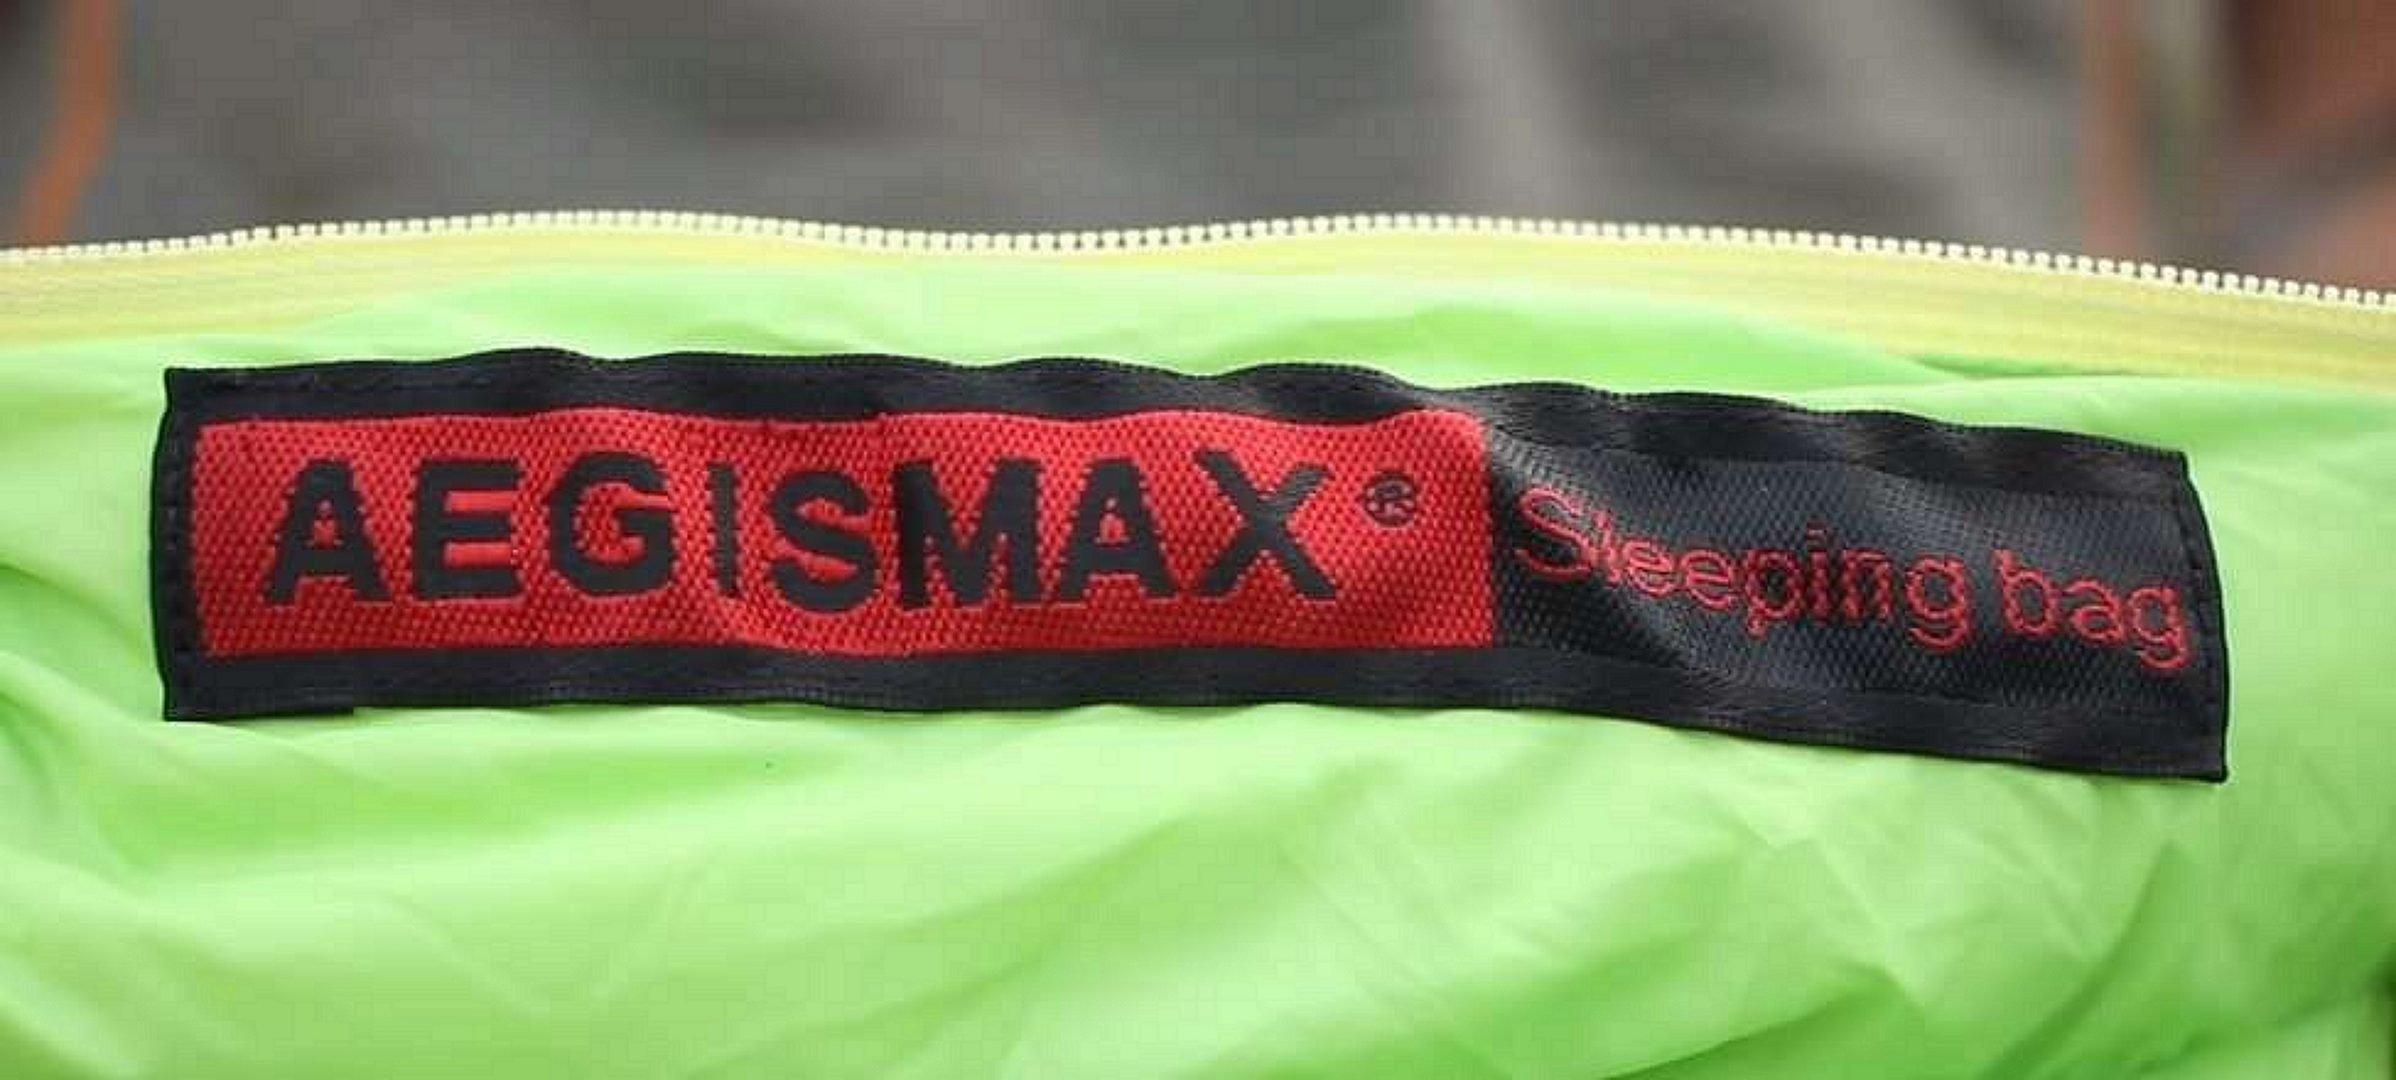 Aegismax Zipper and Logo Close Up View